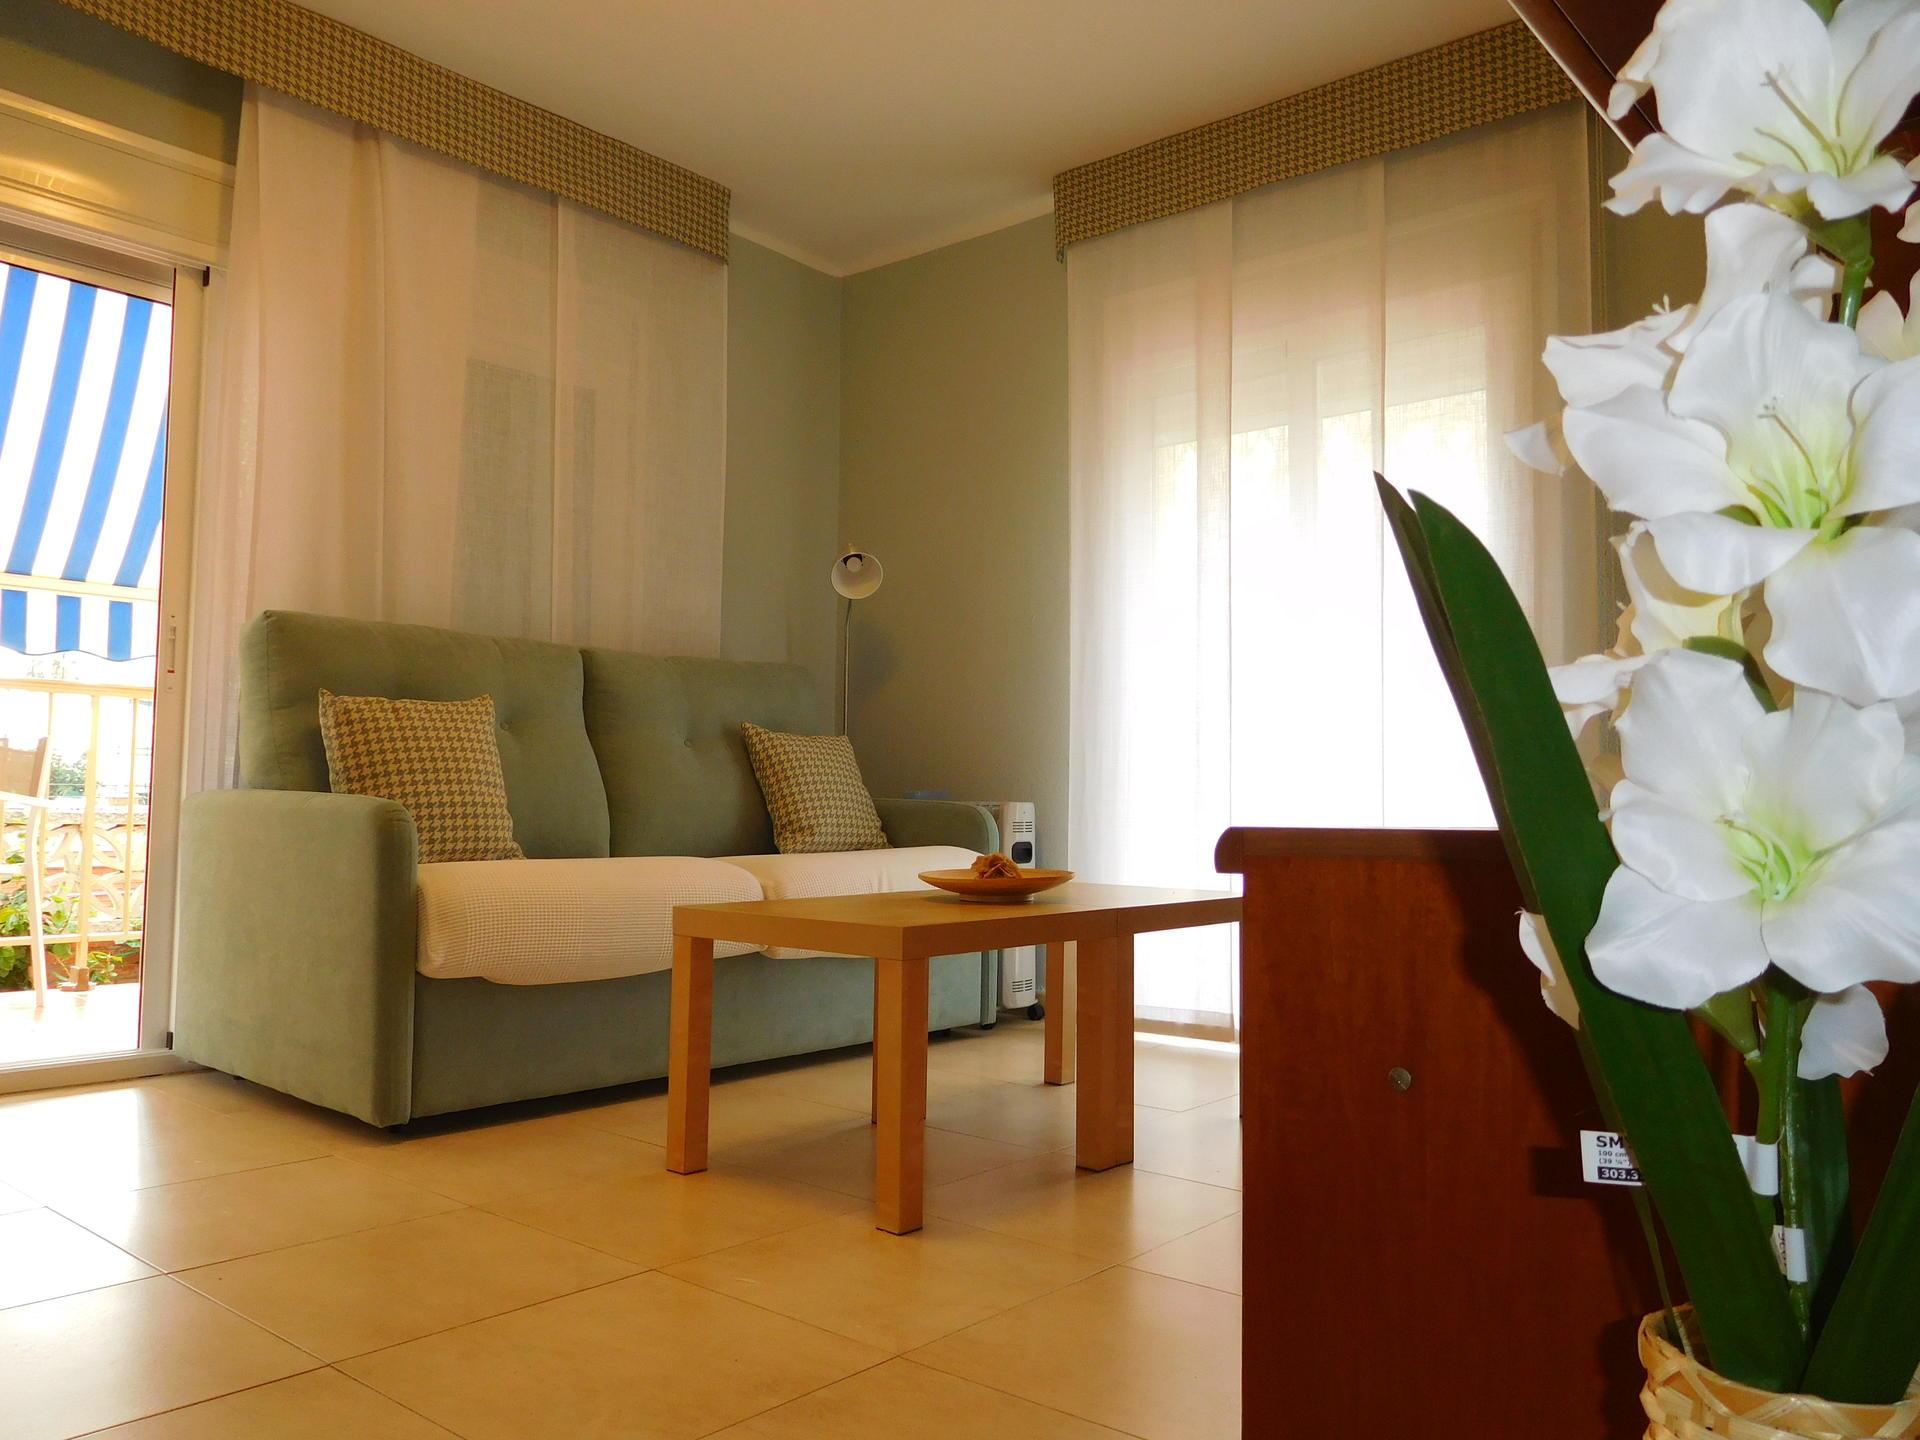 Apartamento -                                       Cambrils -                                       2 dormitorios -                                       4 ocupantes